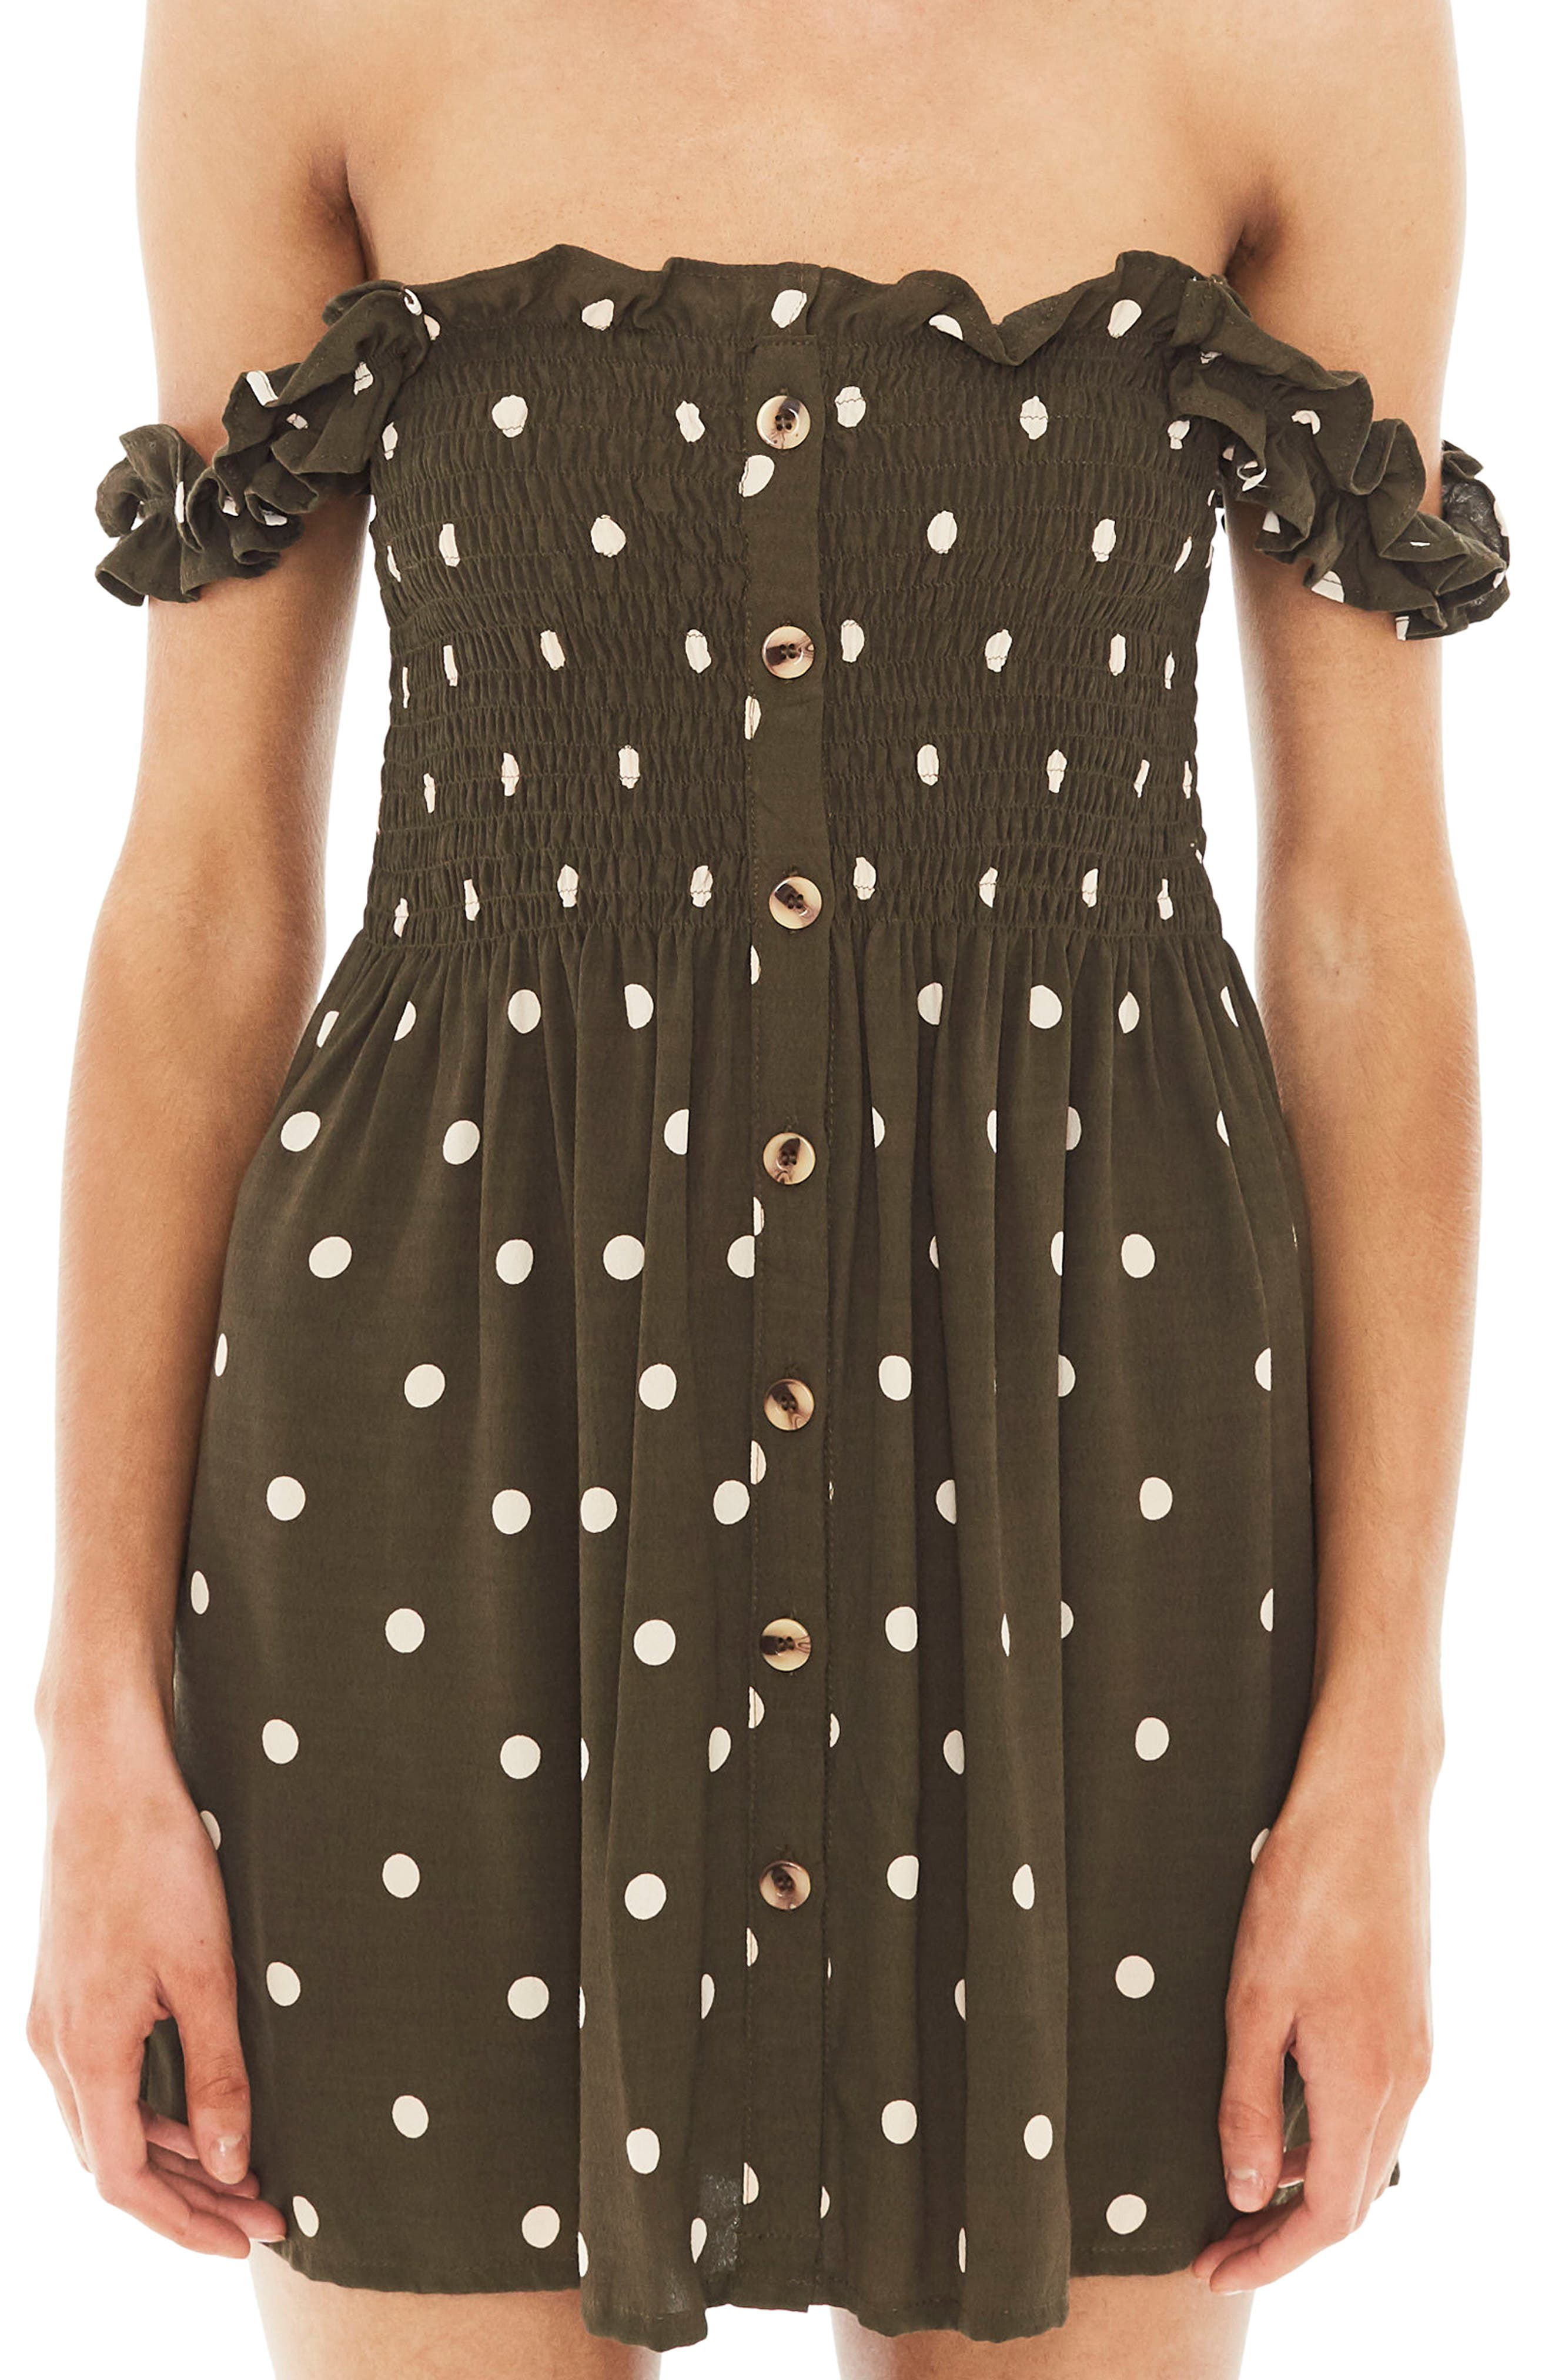 Mika Polka Dot Off the Shoulder Dress,                             Alternate thumbnail 4, color,                             Ronja Dot Print